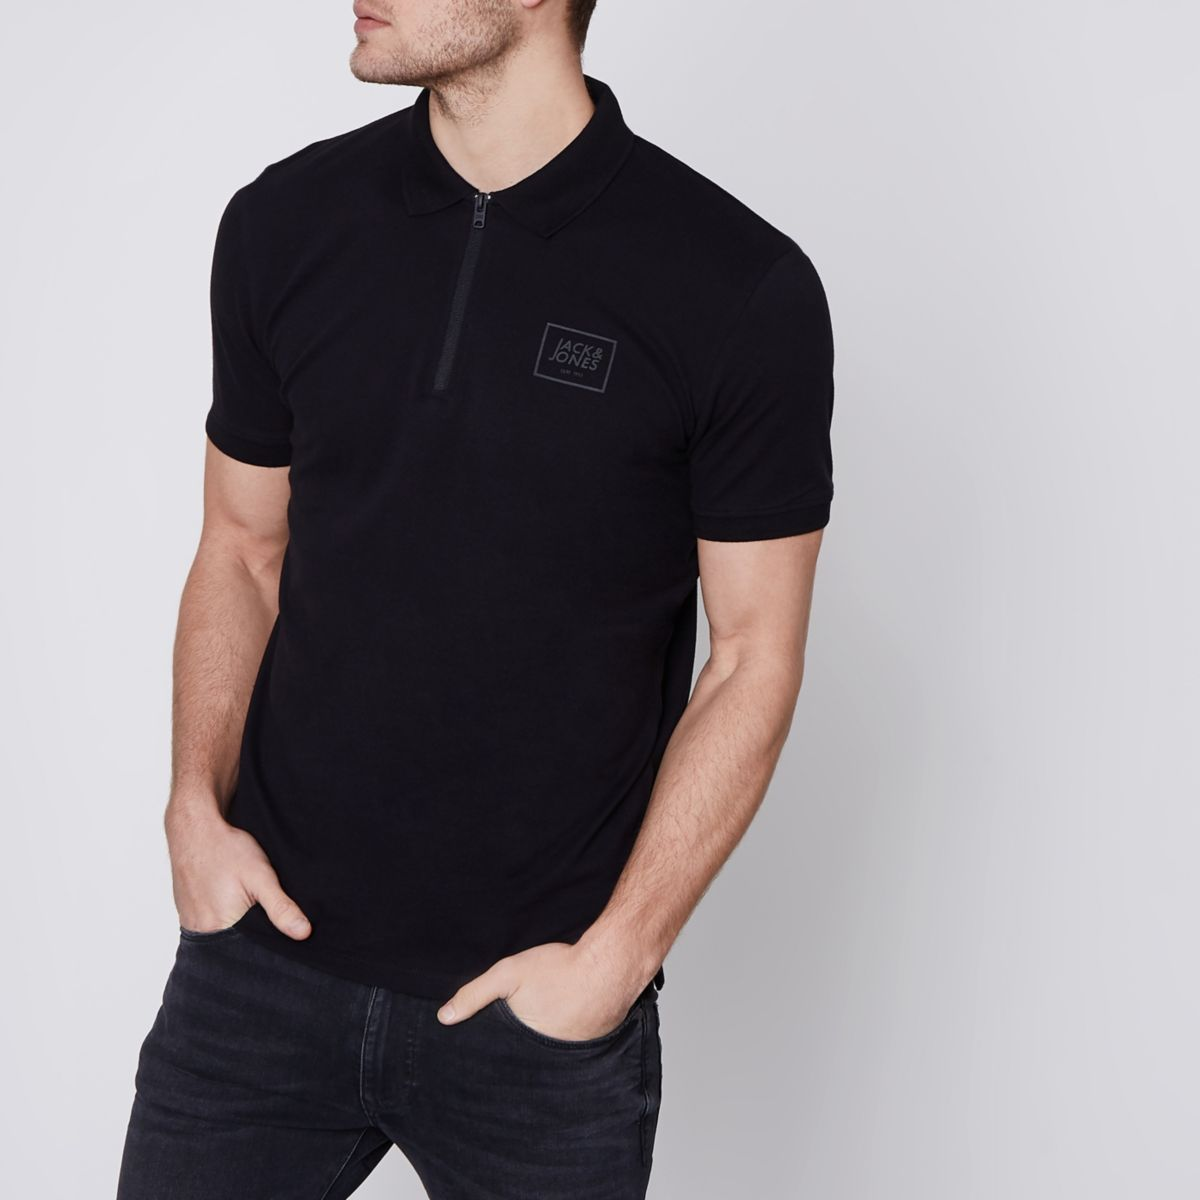 Jack & Jones Core – Schwarzes Polohemd mit Reißverschluss